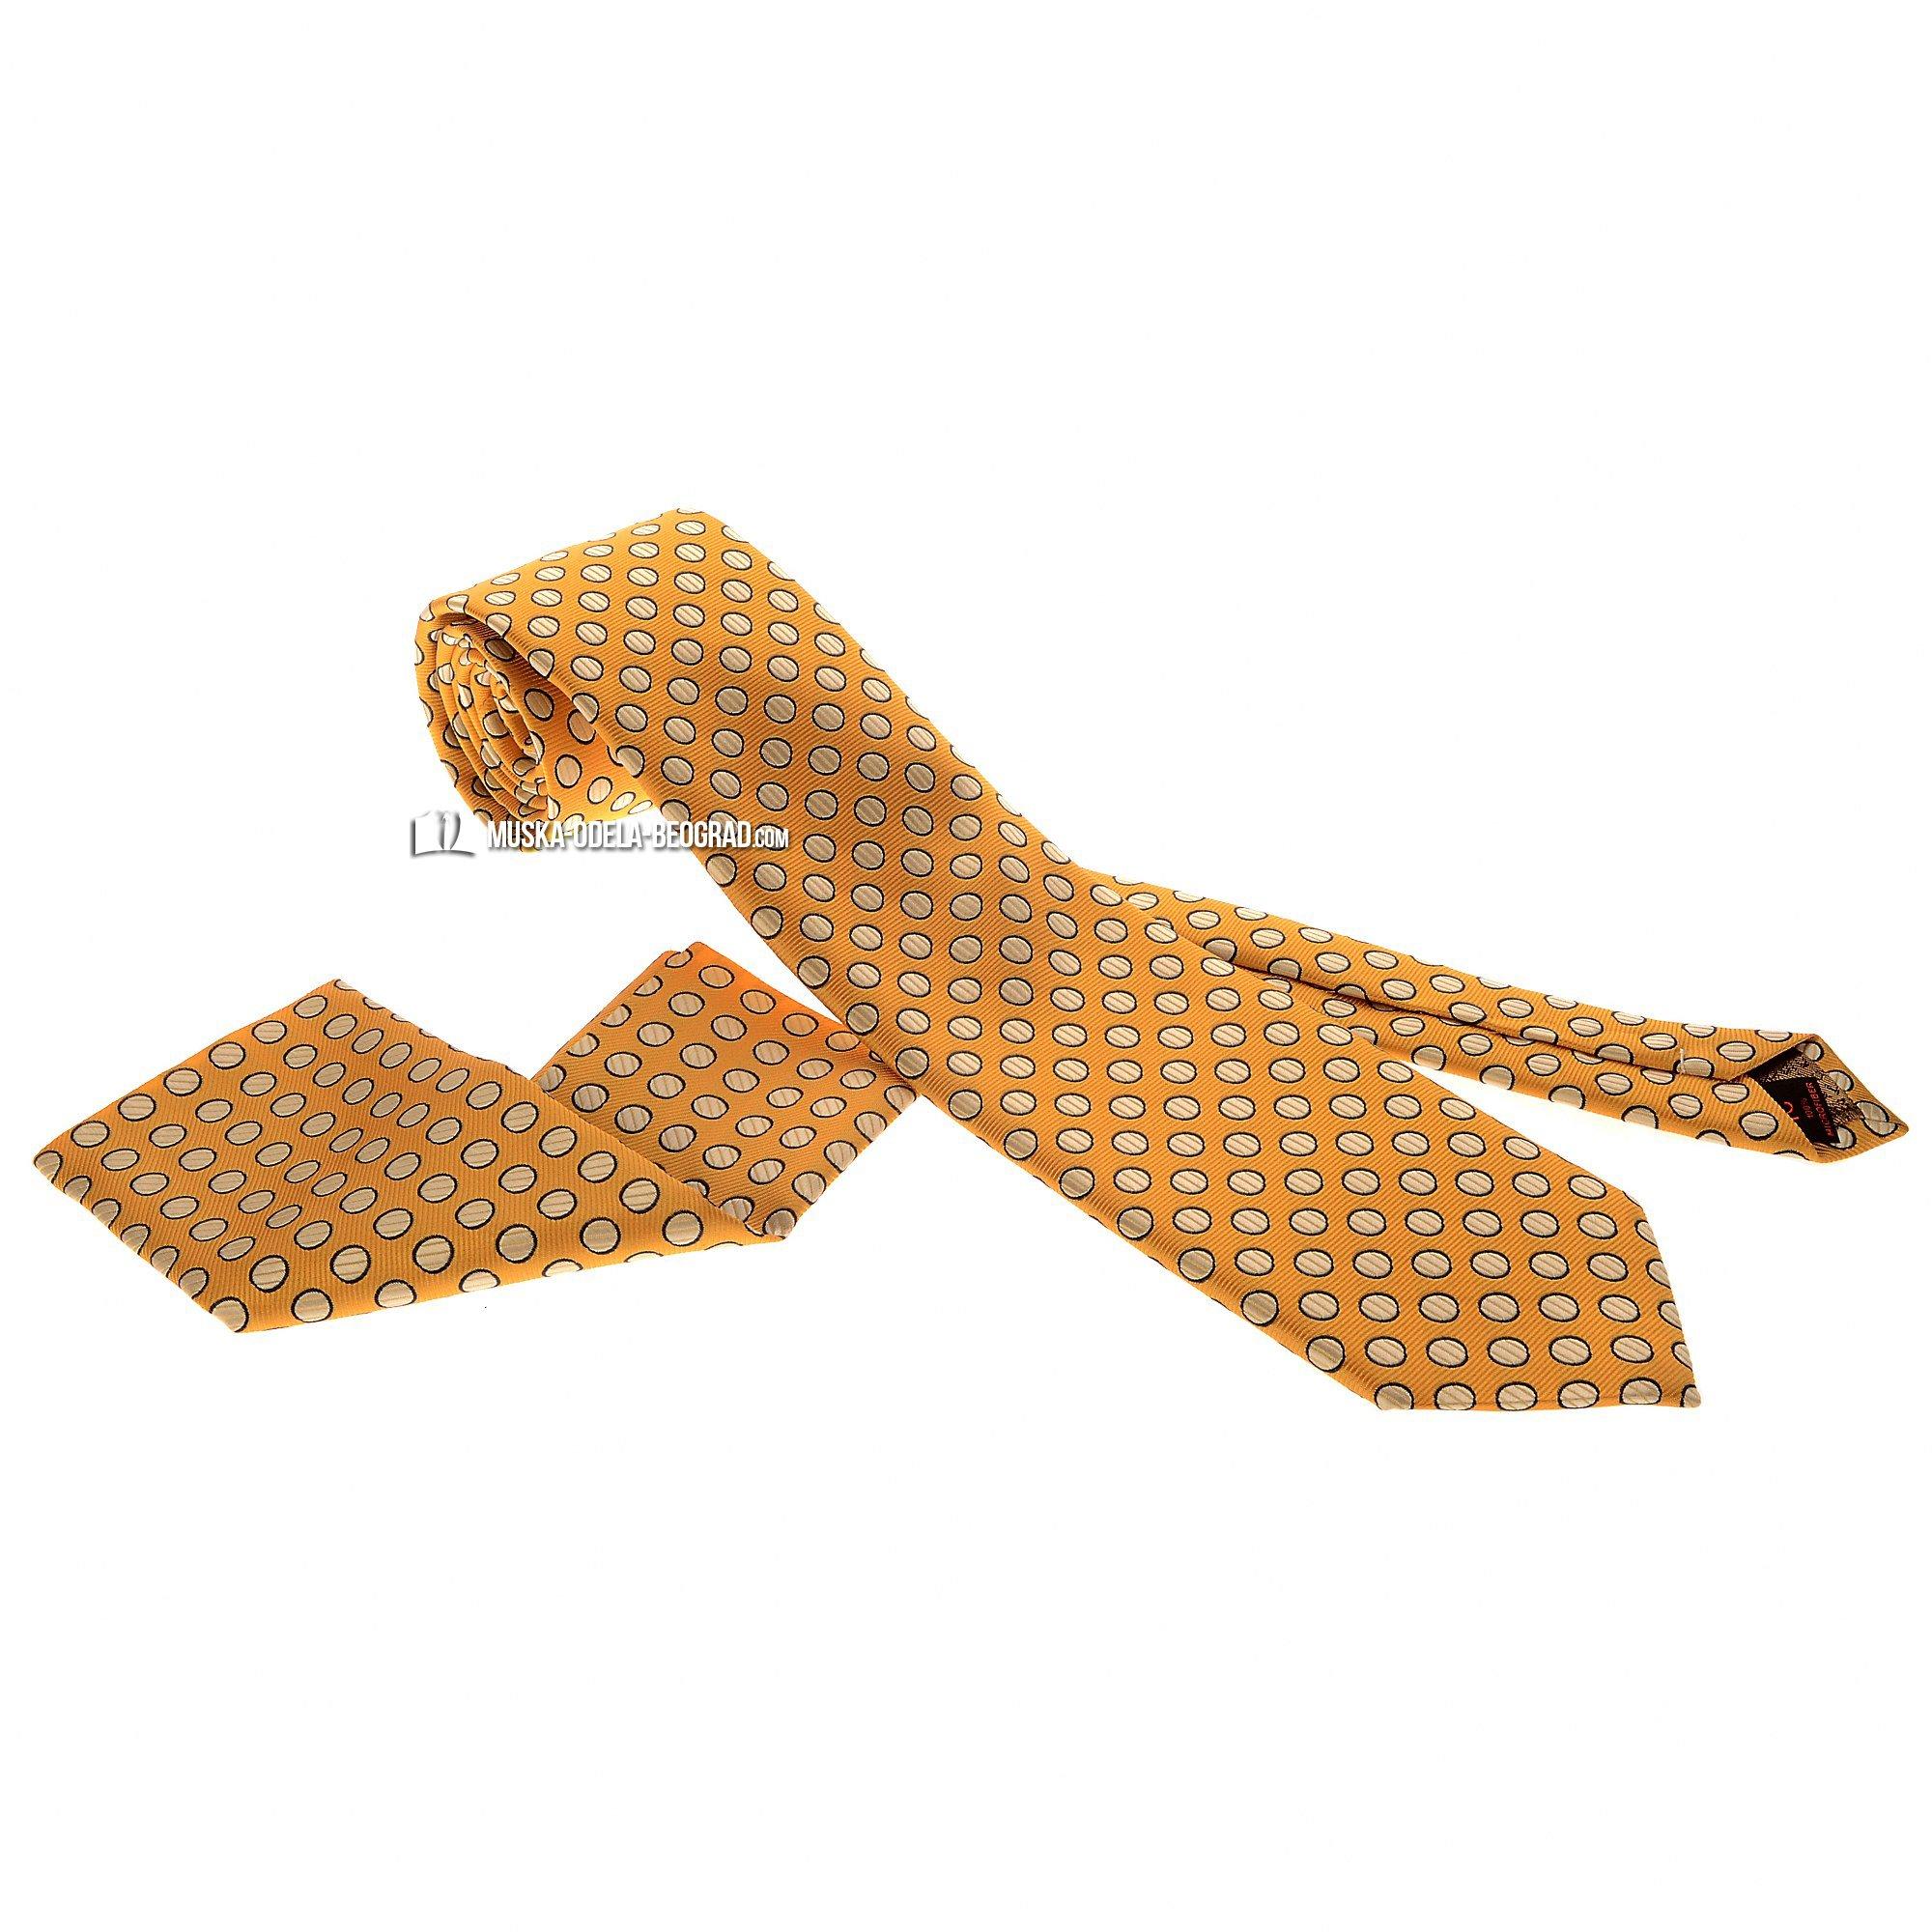 zuta muska kravata #319 - muska kravata, prodaja muskih kravata, kravate beograd,novi sad, muske kravate cena, kravata za odelo, kravate za odela, svilene kravate, plava muska kravata, muska odela, muske kosulje, prodaja kravata beograd, kravate cene, kravate cena